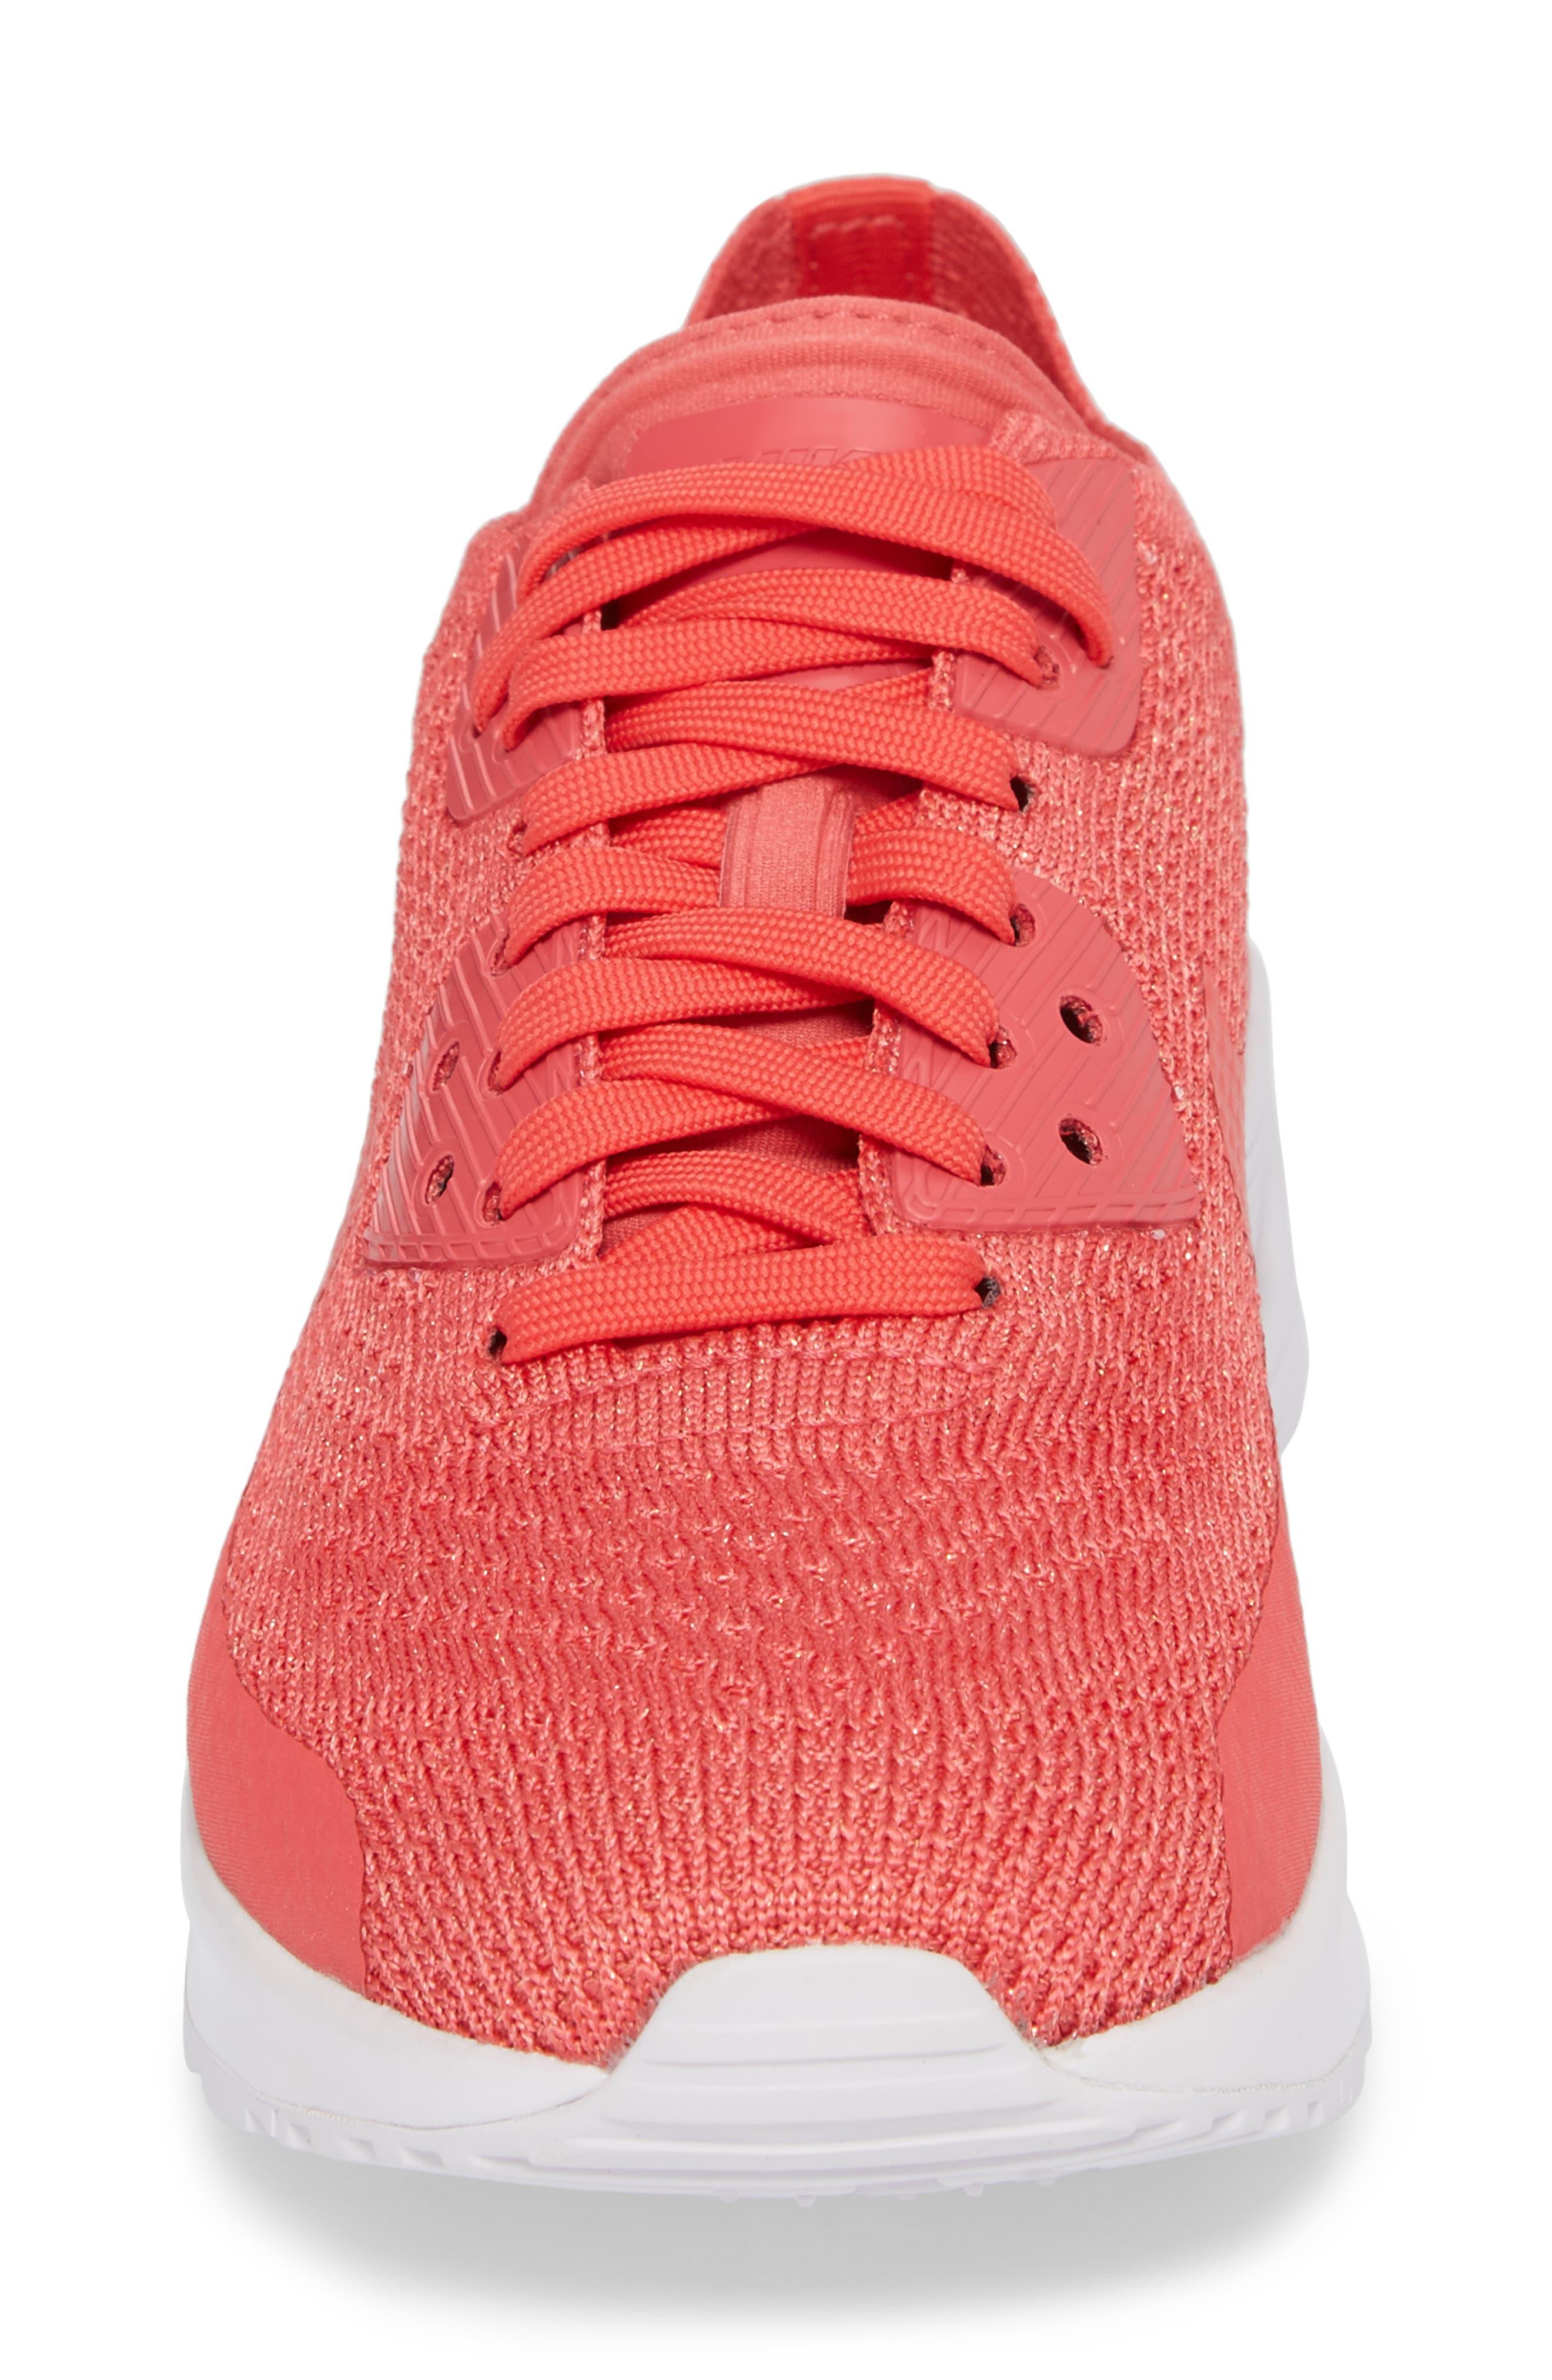 Air Max 90 Flyknit Ultra 2.0 Sneaker,                             Alternate thumbnail 4, color,                             Geranium/ Geranium